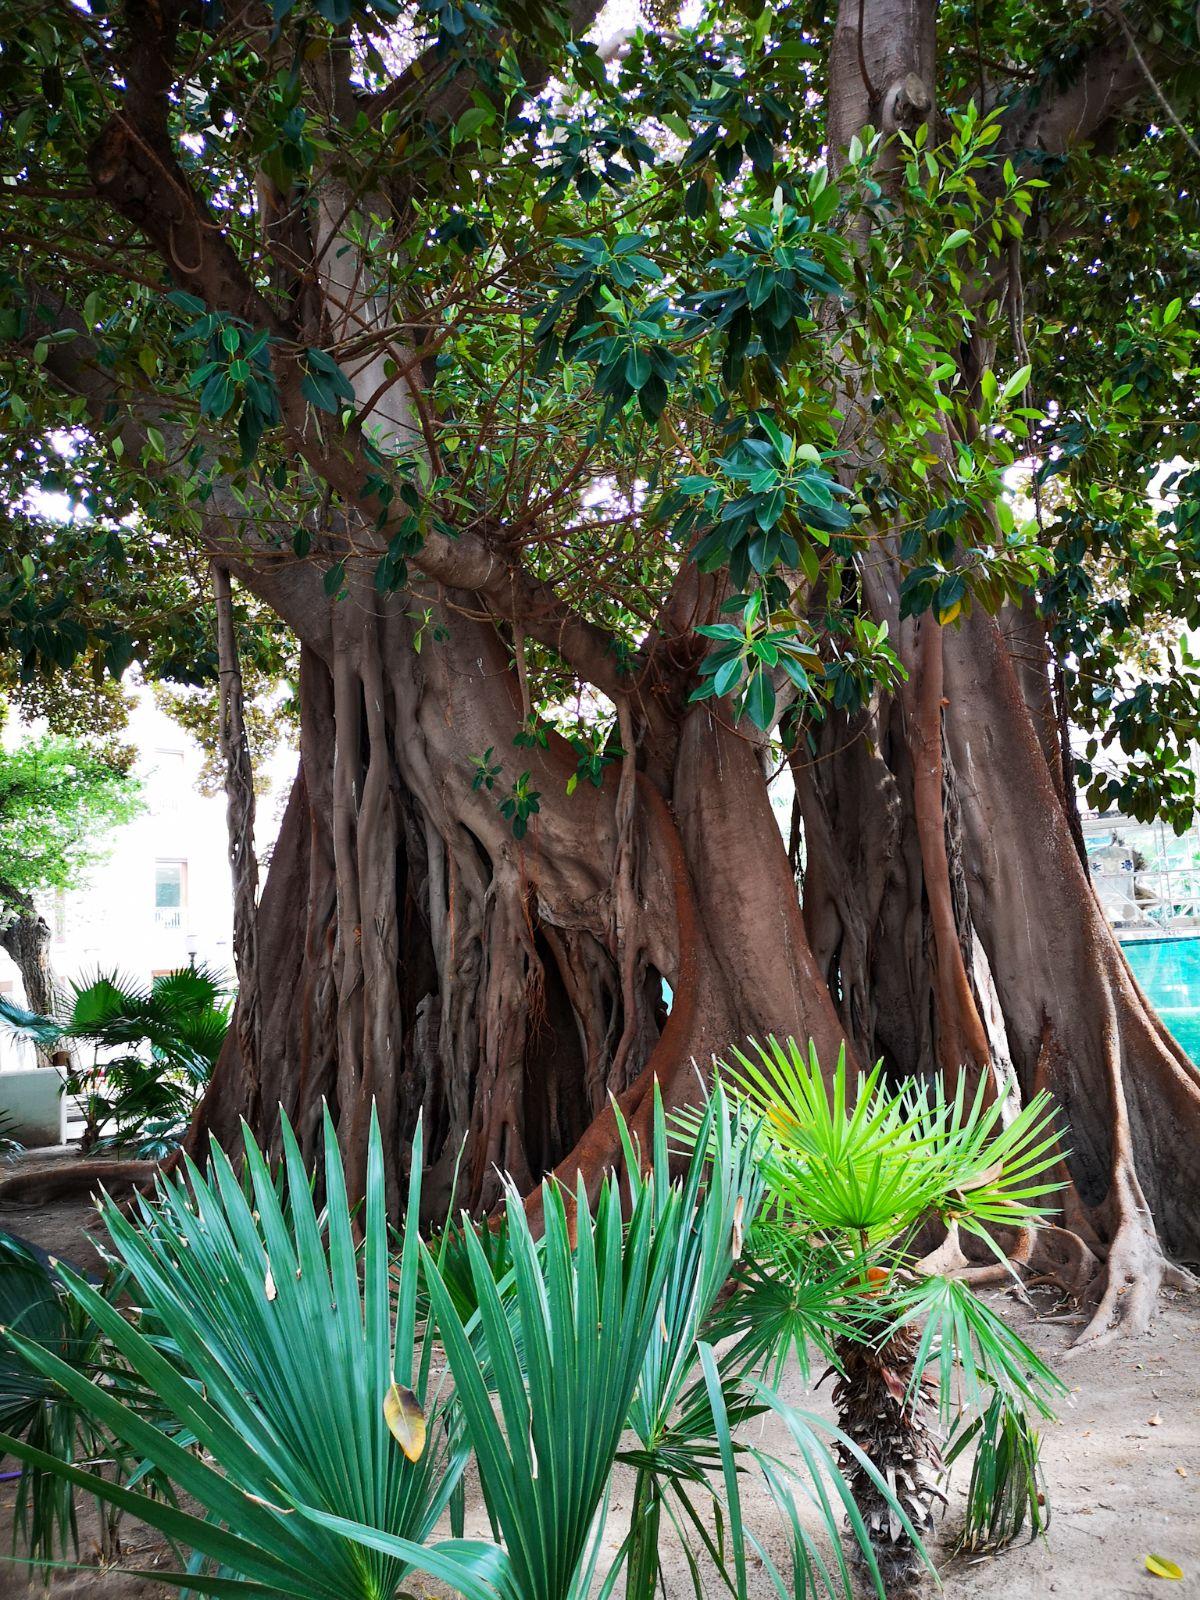 alicante fikus drzewa ogromne stare miasto